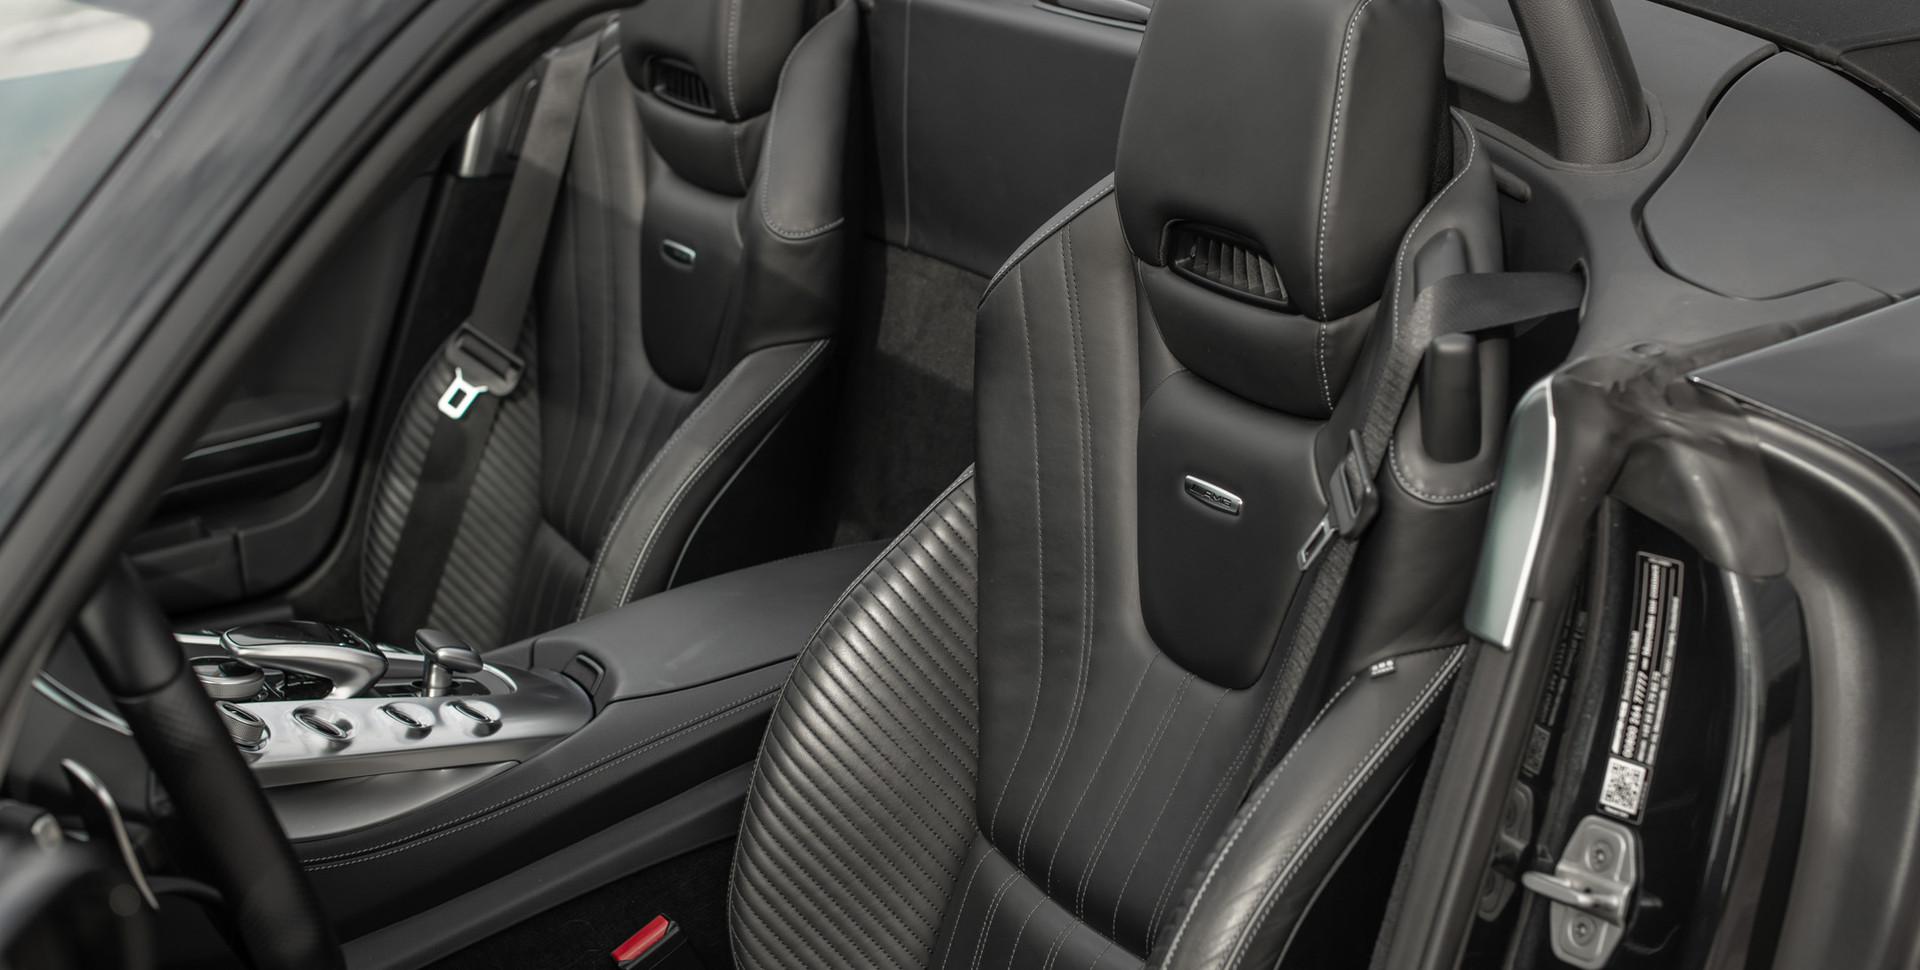 MB AMG GT Cabrio-14.jpg.JPG